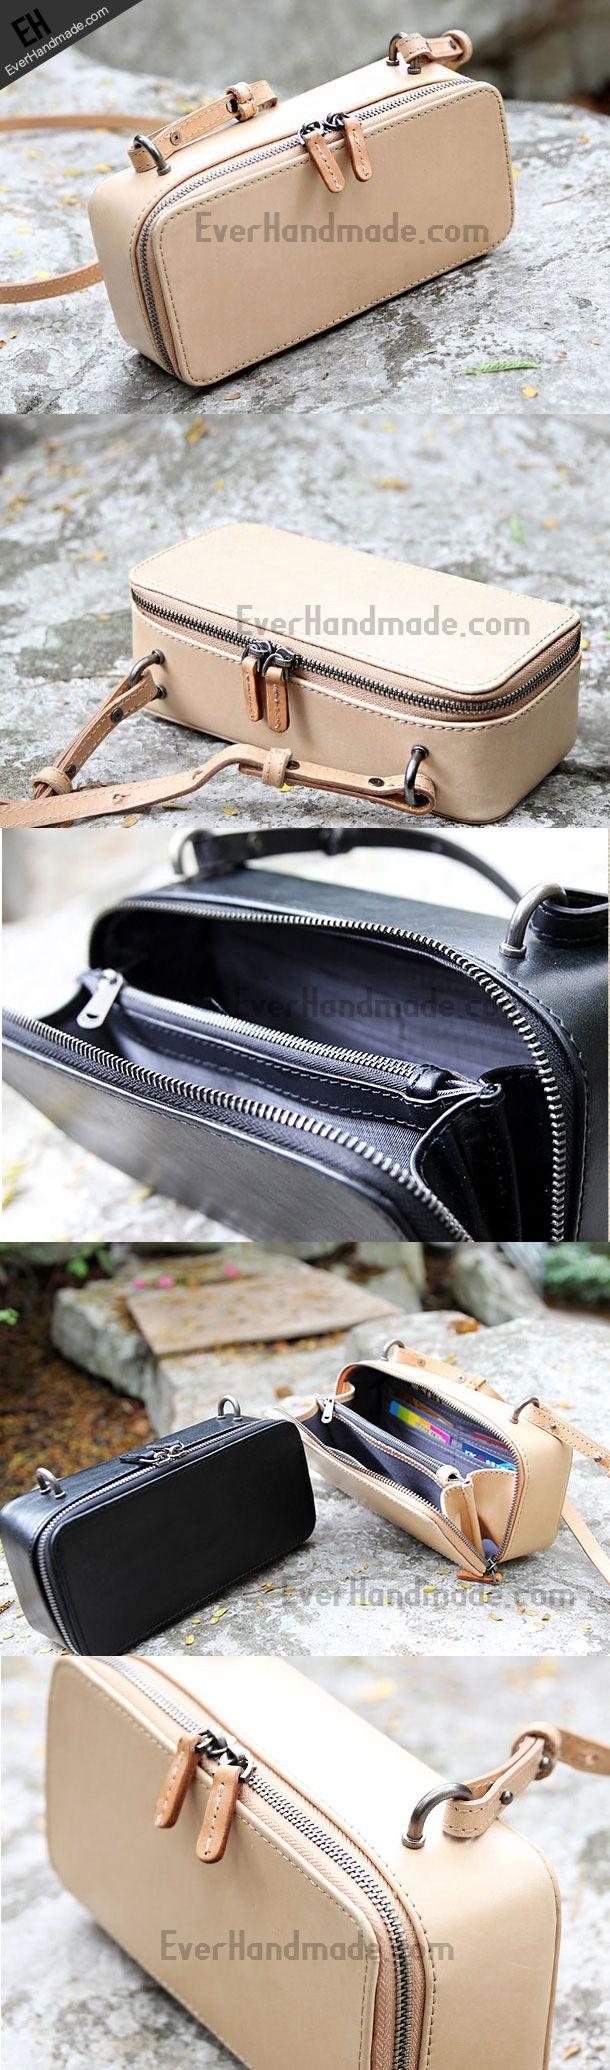 Handmade black phone purse leather crossbody bag purse shoulder bag for